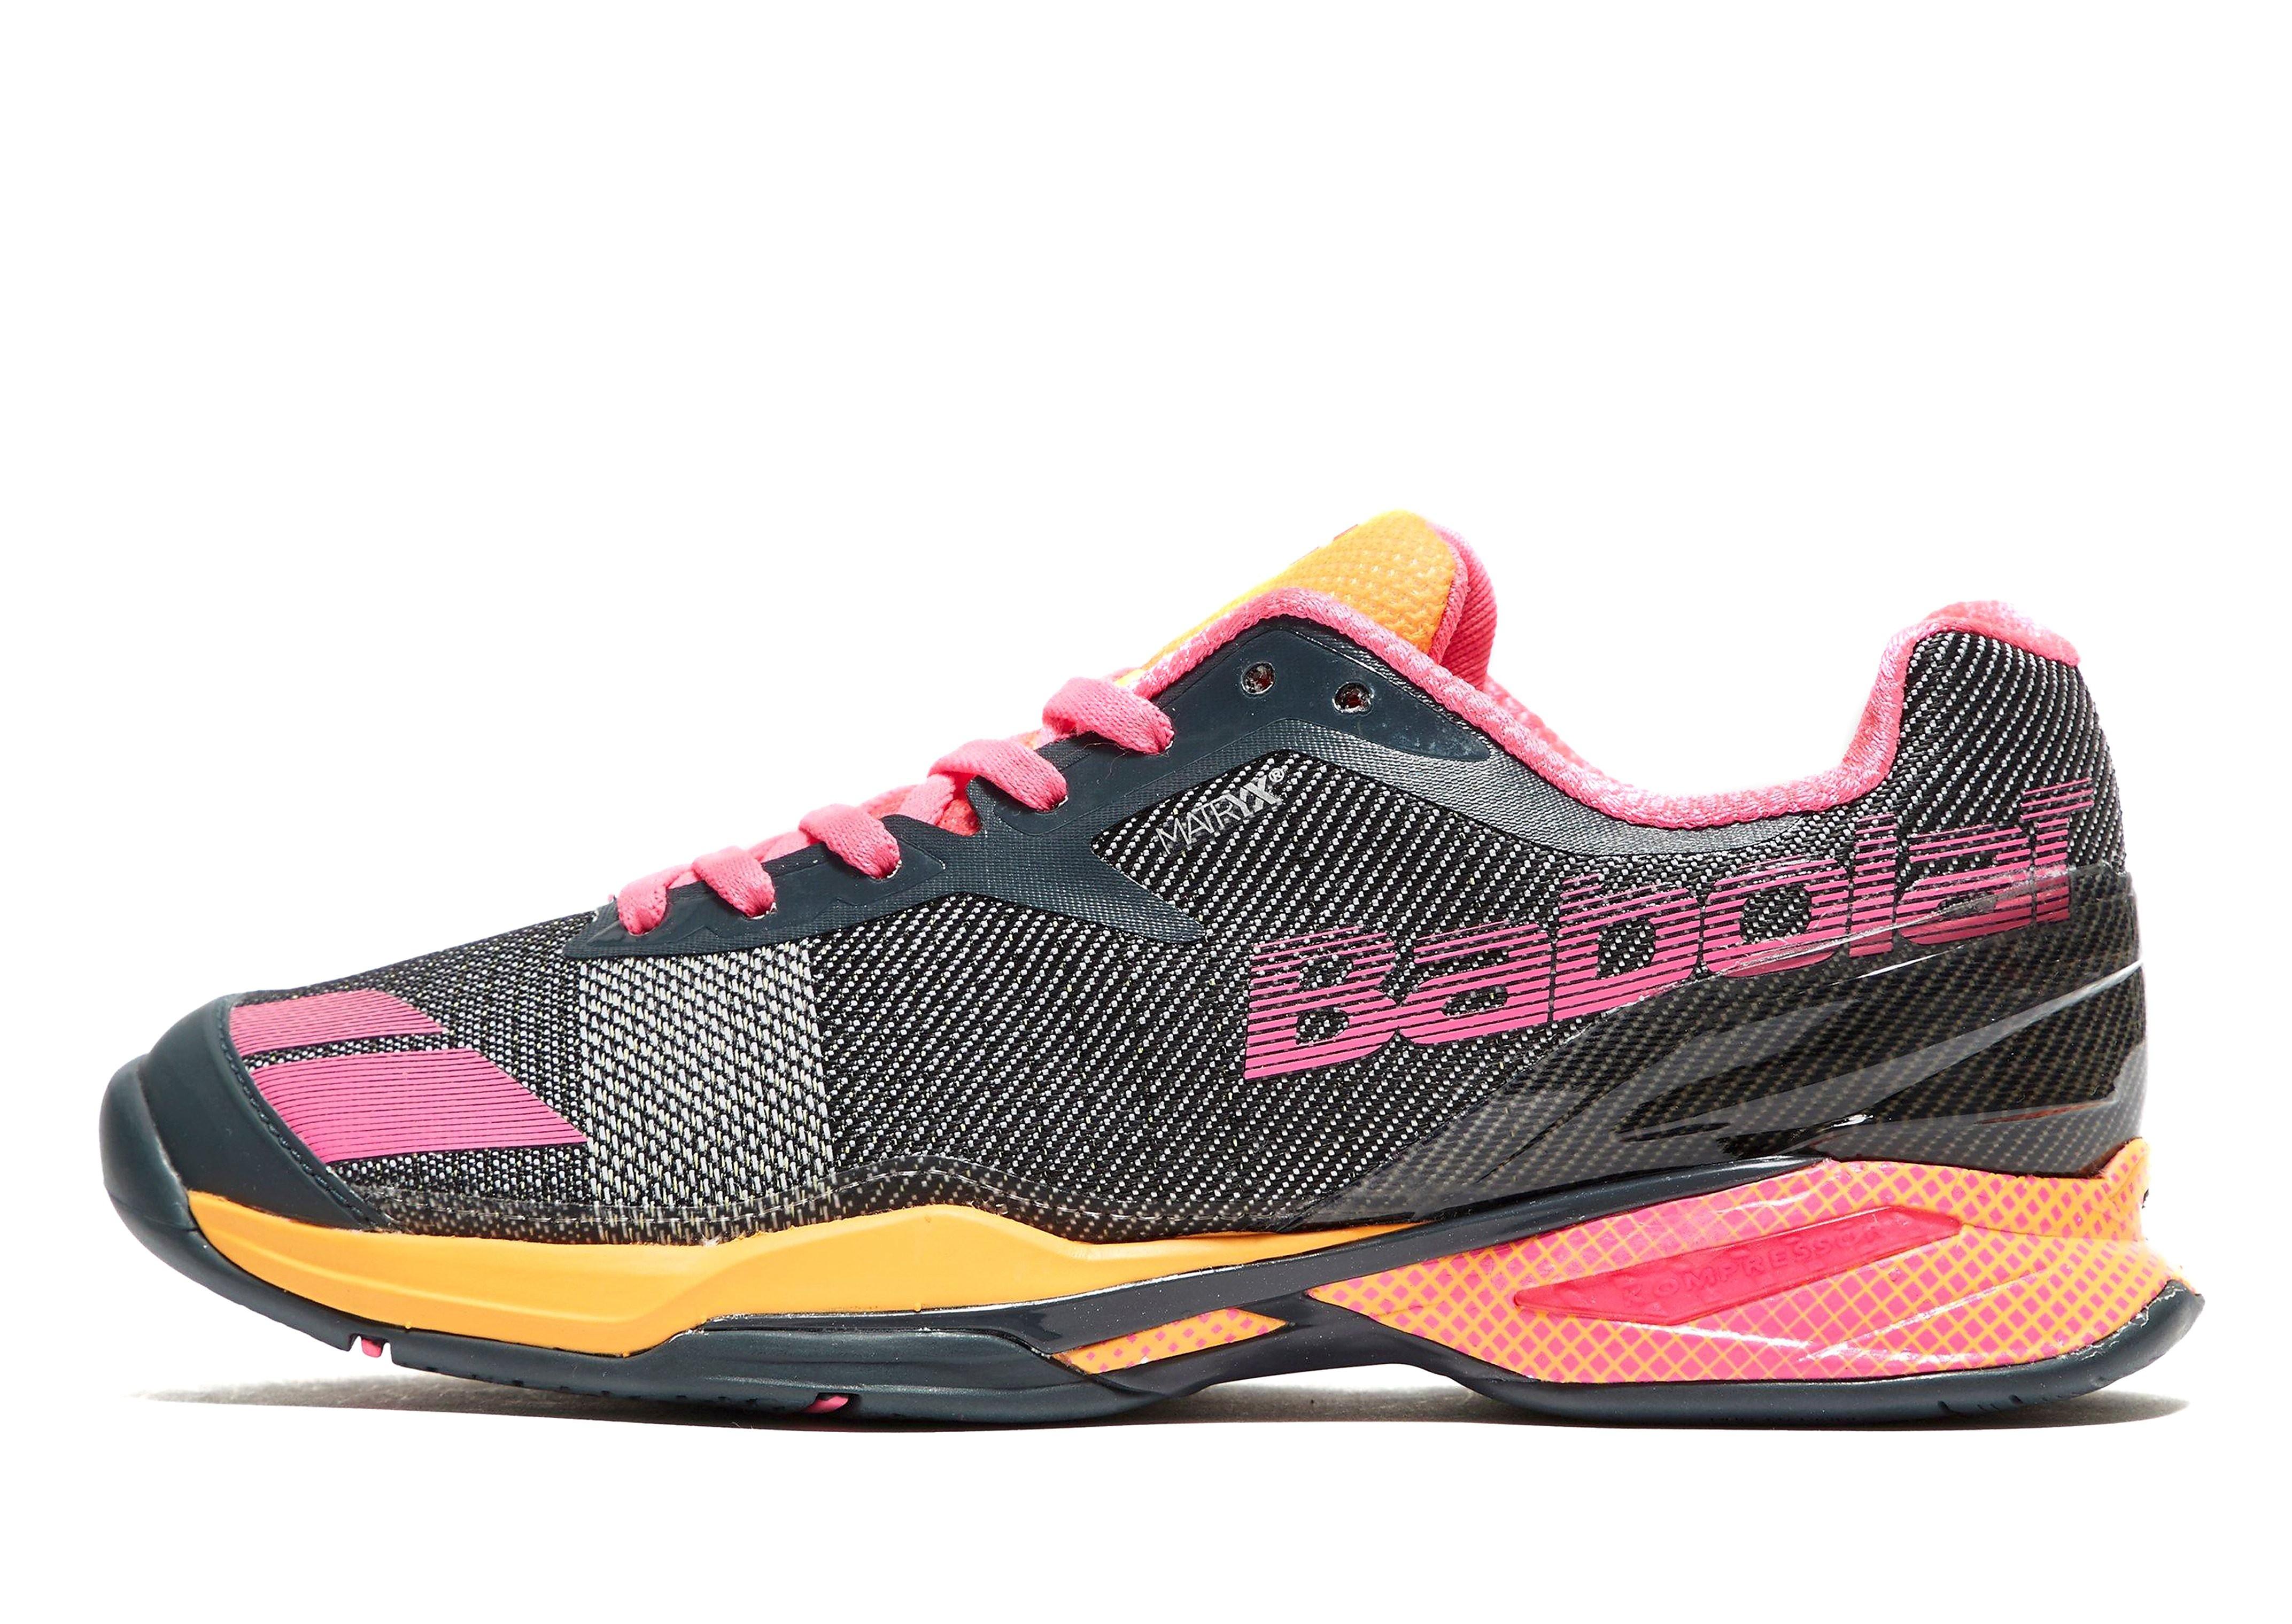 Babolat Jet All Court Tennis Shoe Women's